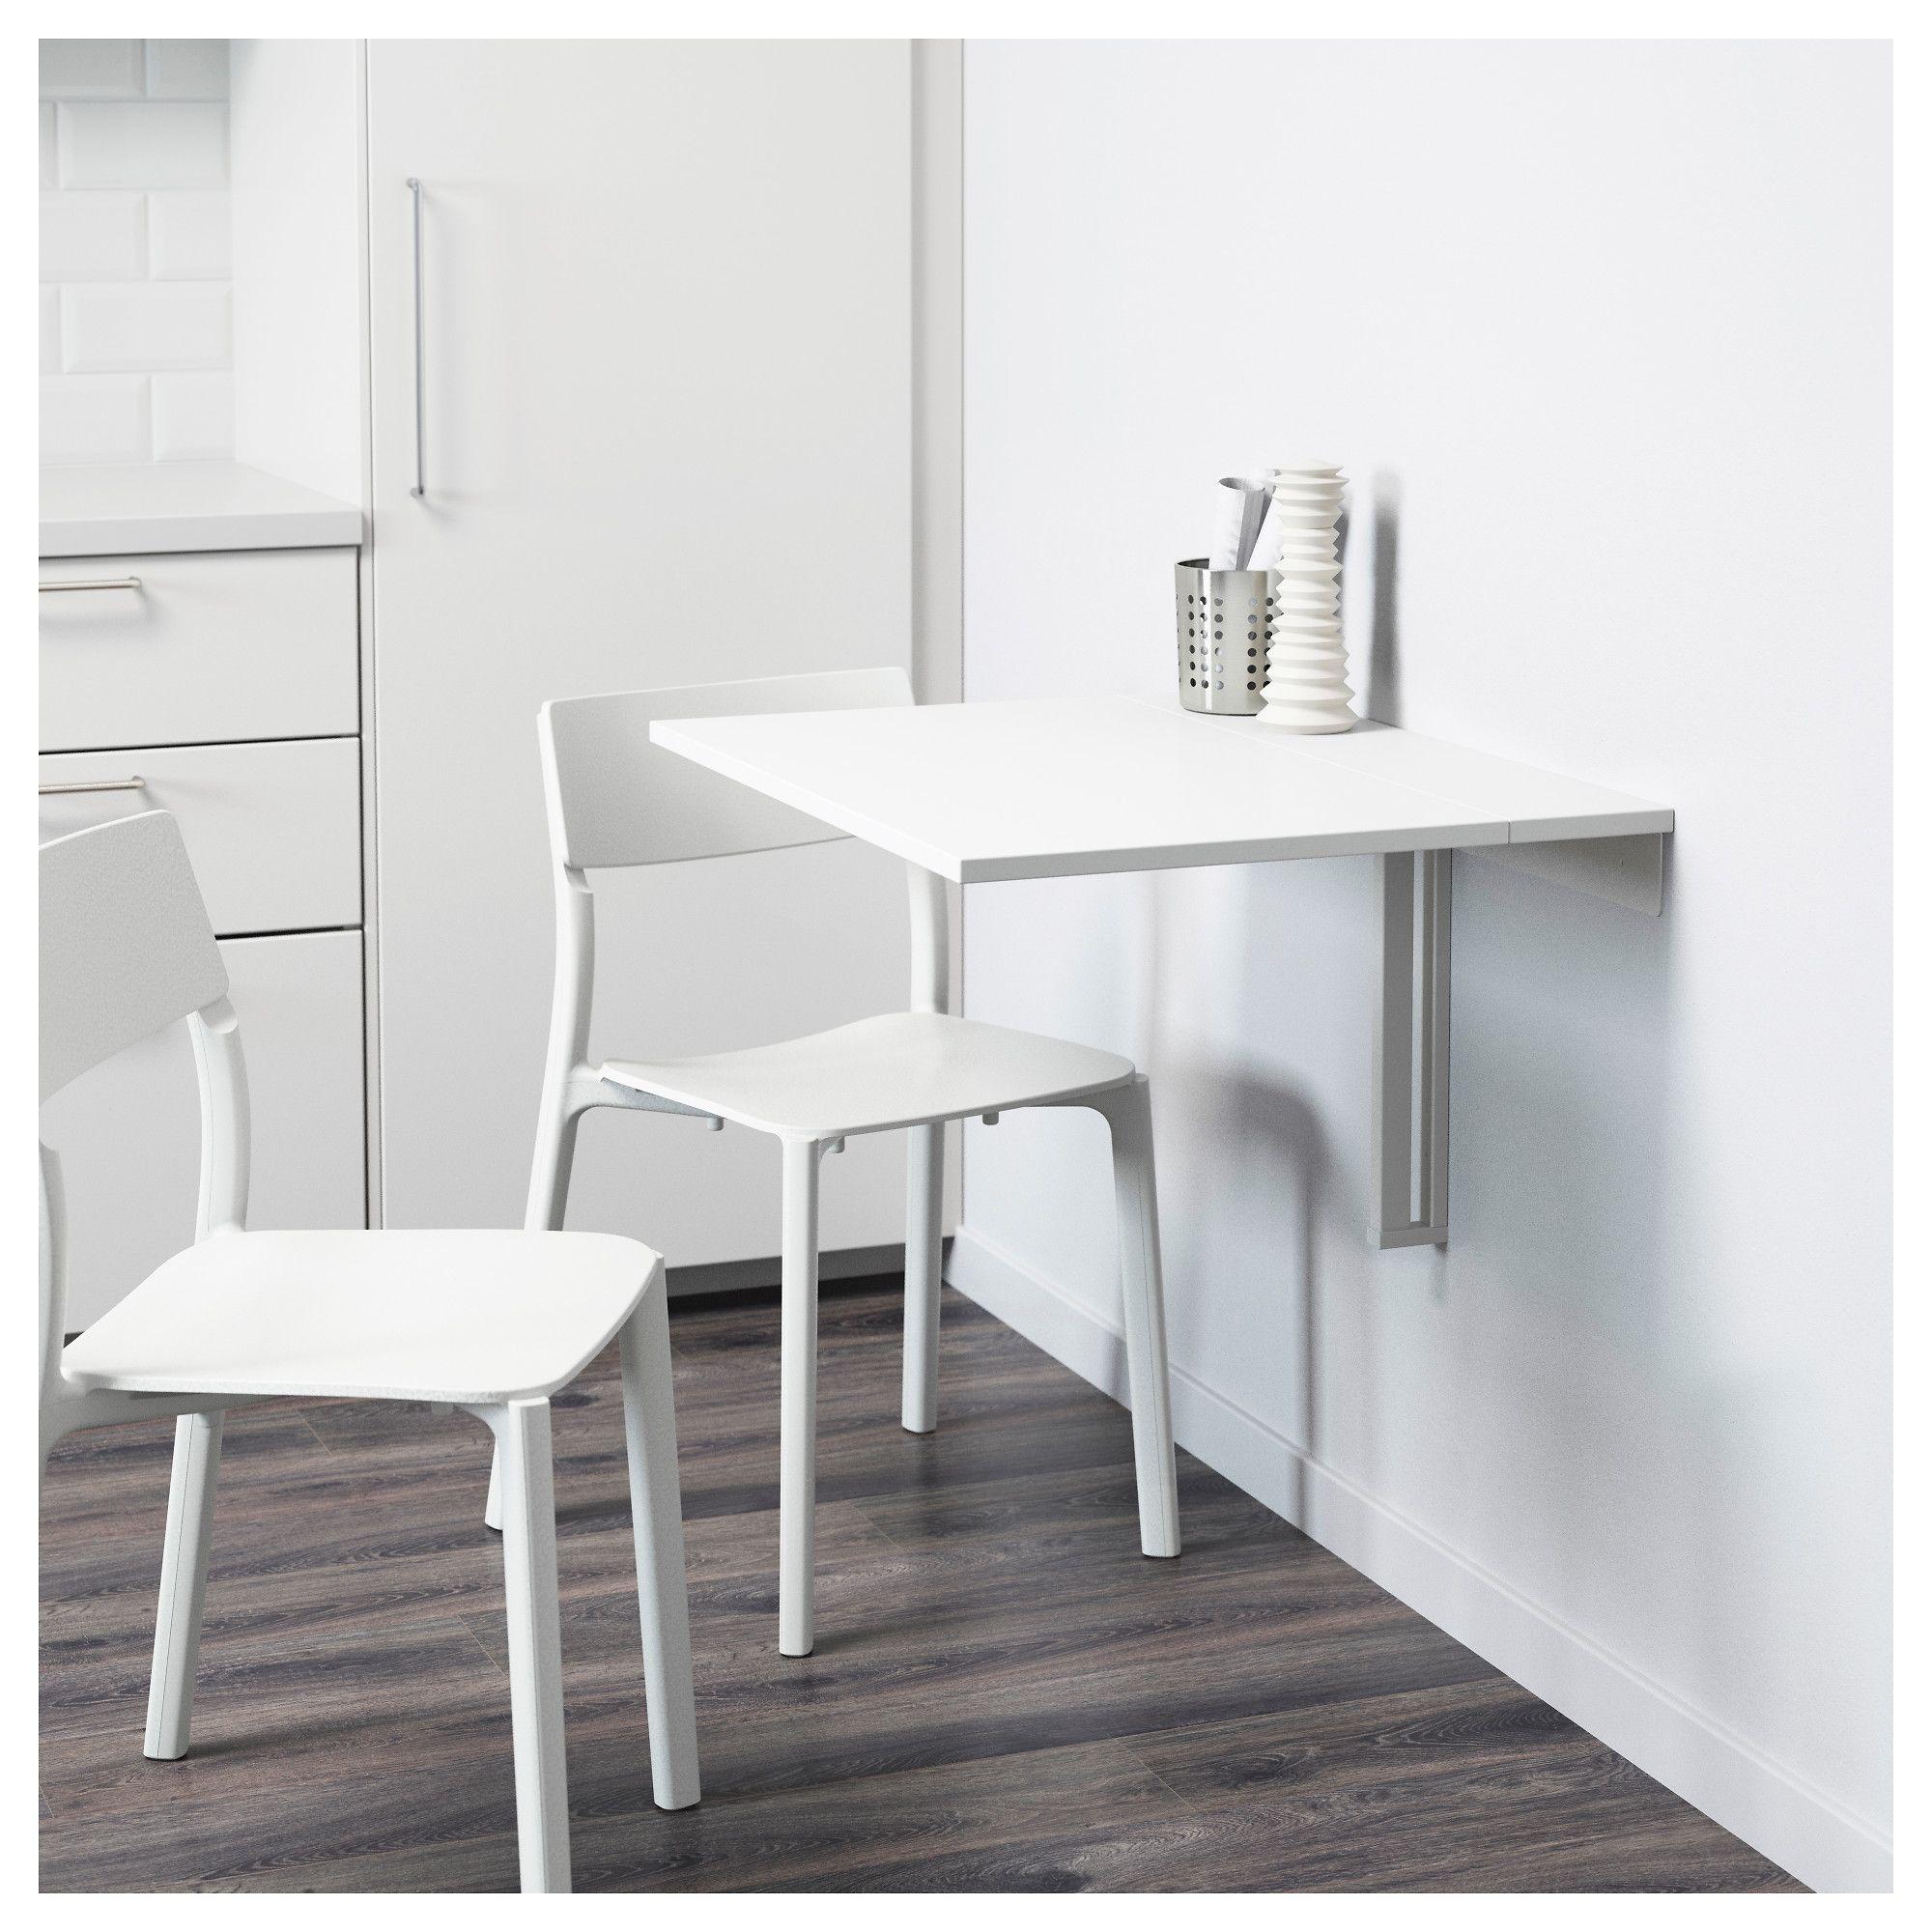 Norberg Mesa Plegable De Pared Blanco Ikea Drop Leaf Table Ikea Folding Table Ikea Wall